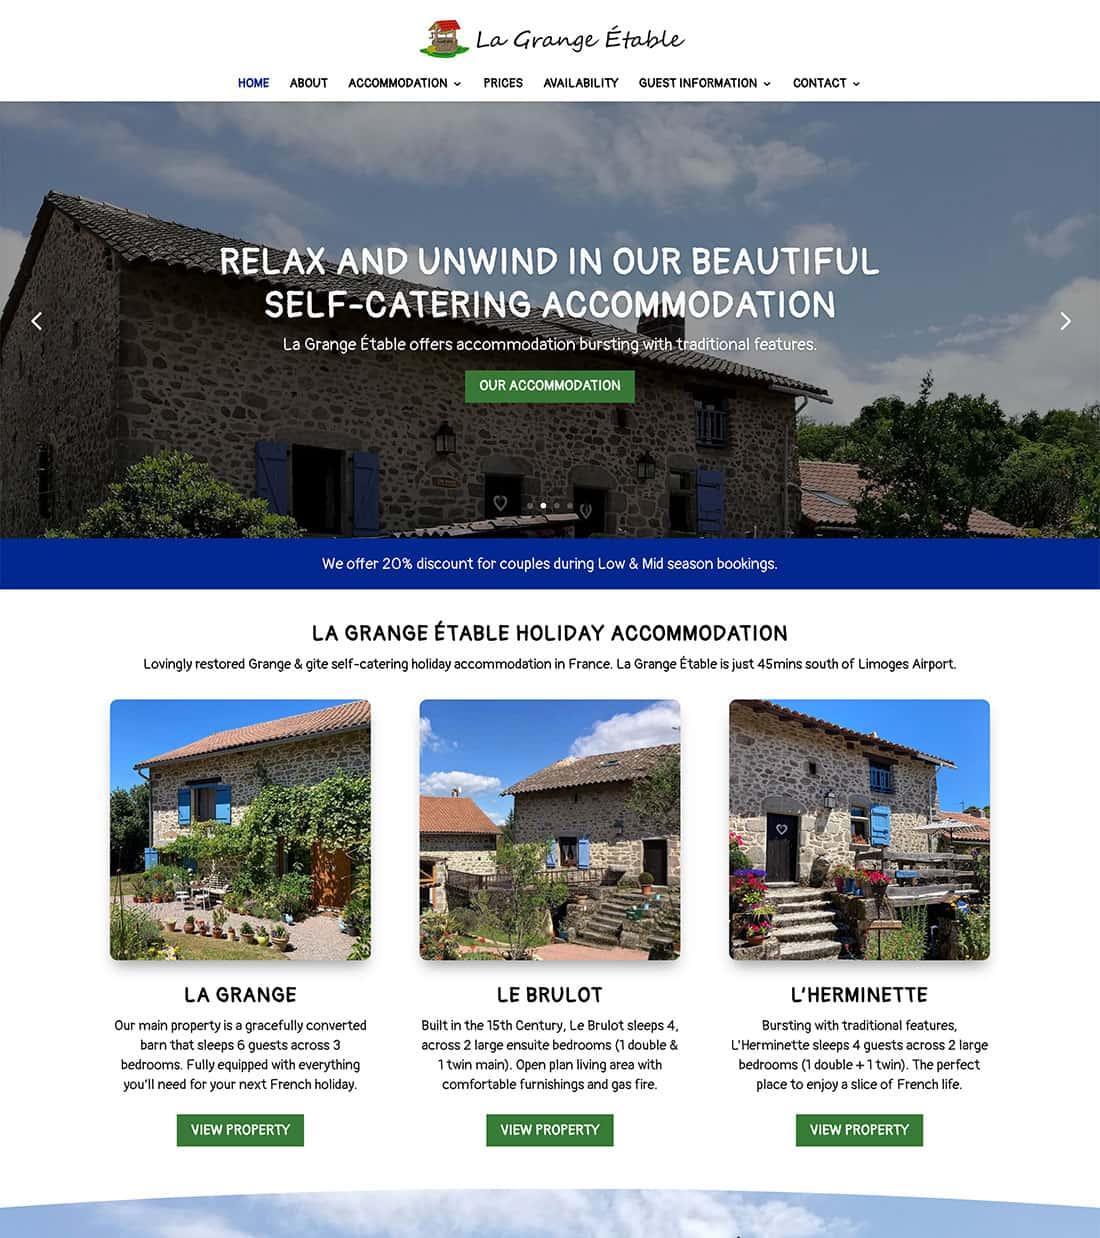 NEW Homepage Design - La Grange Etable